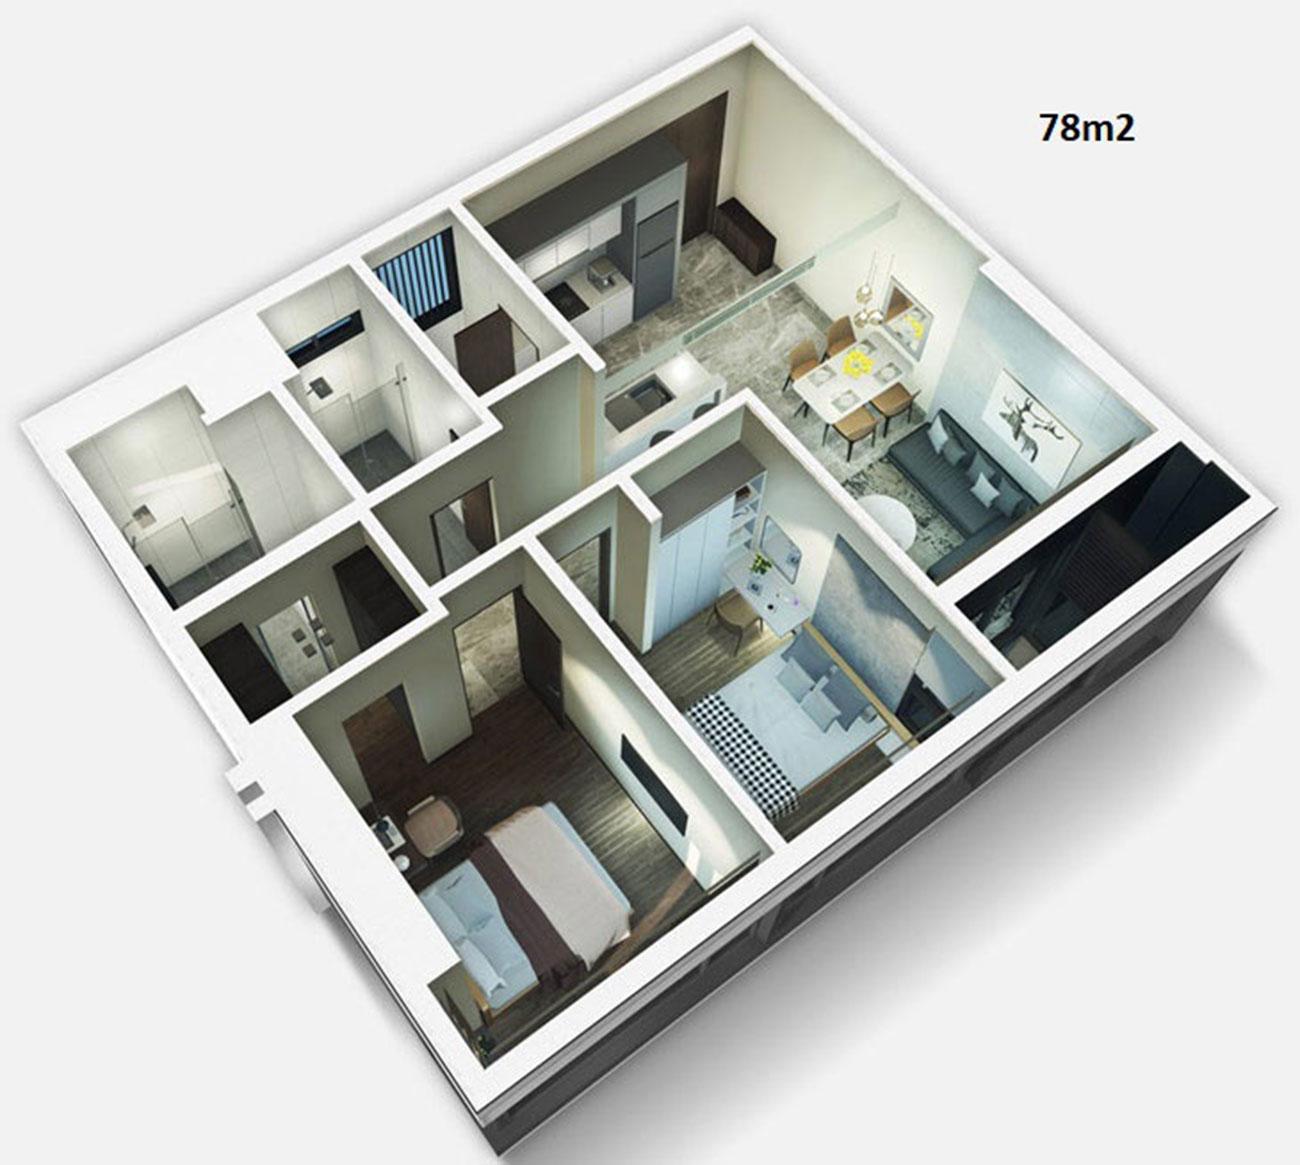 Thiết kế chi tiết căn hộ Kingdom 101 diện tích 78 m2